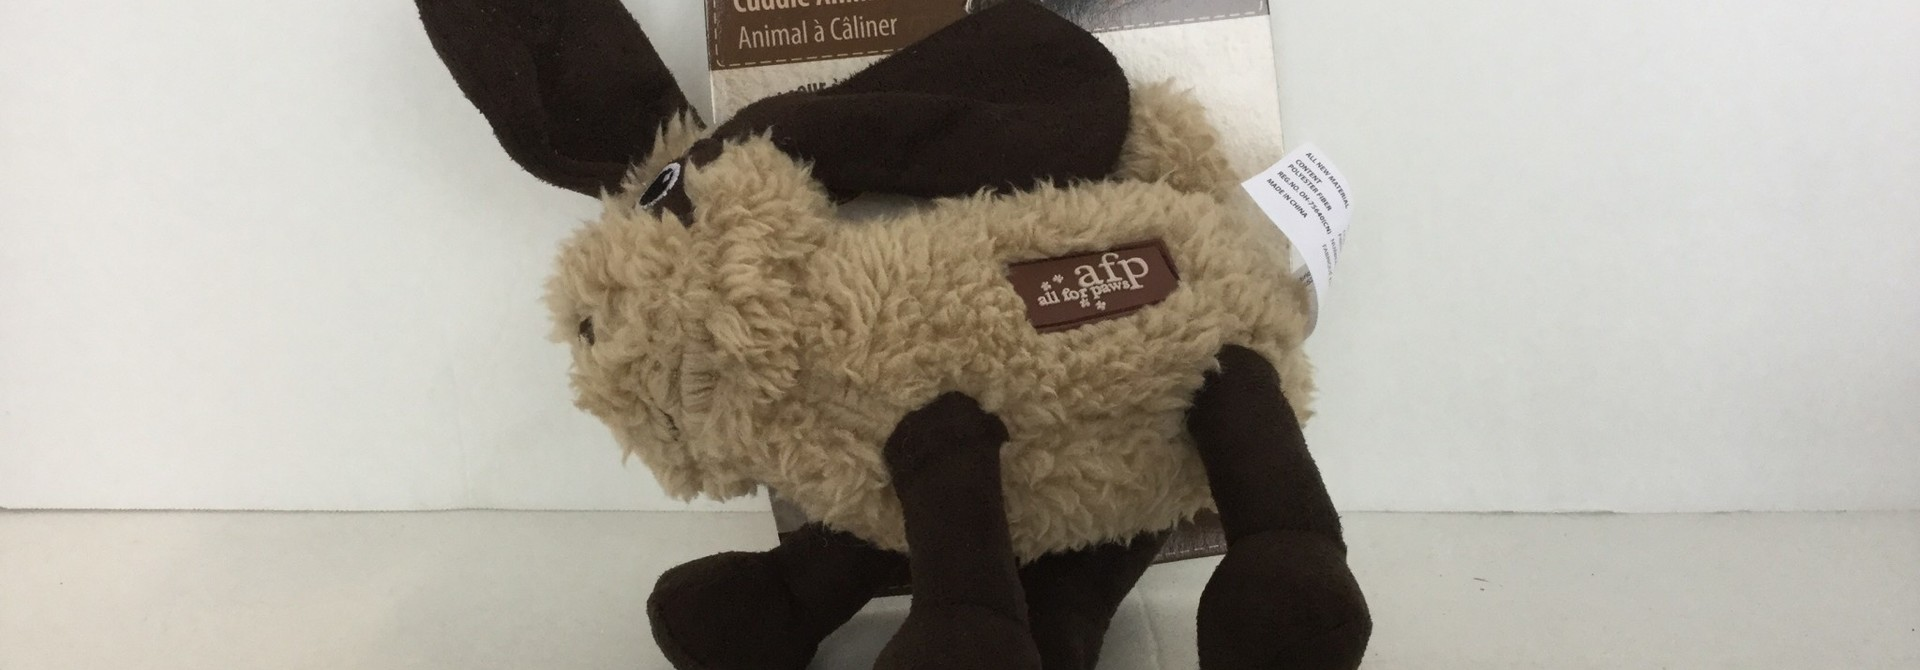 "AFP Lamb Cuddle Animals, 7"", Assorted"